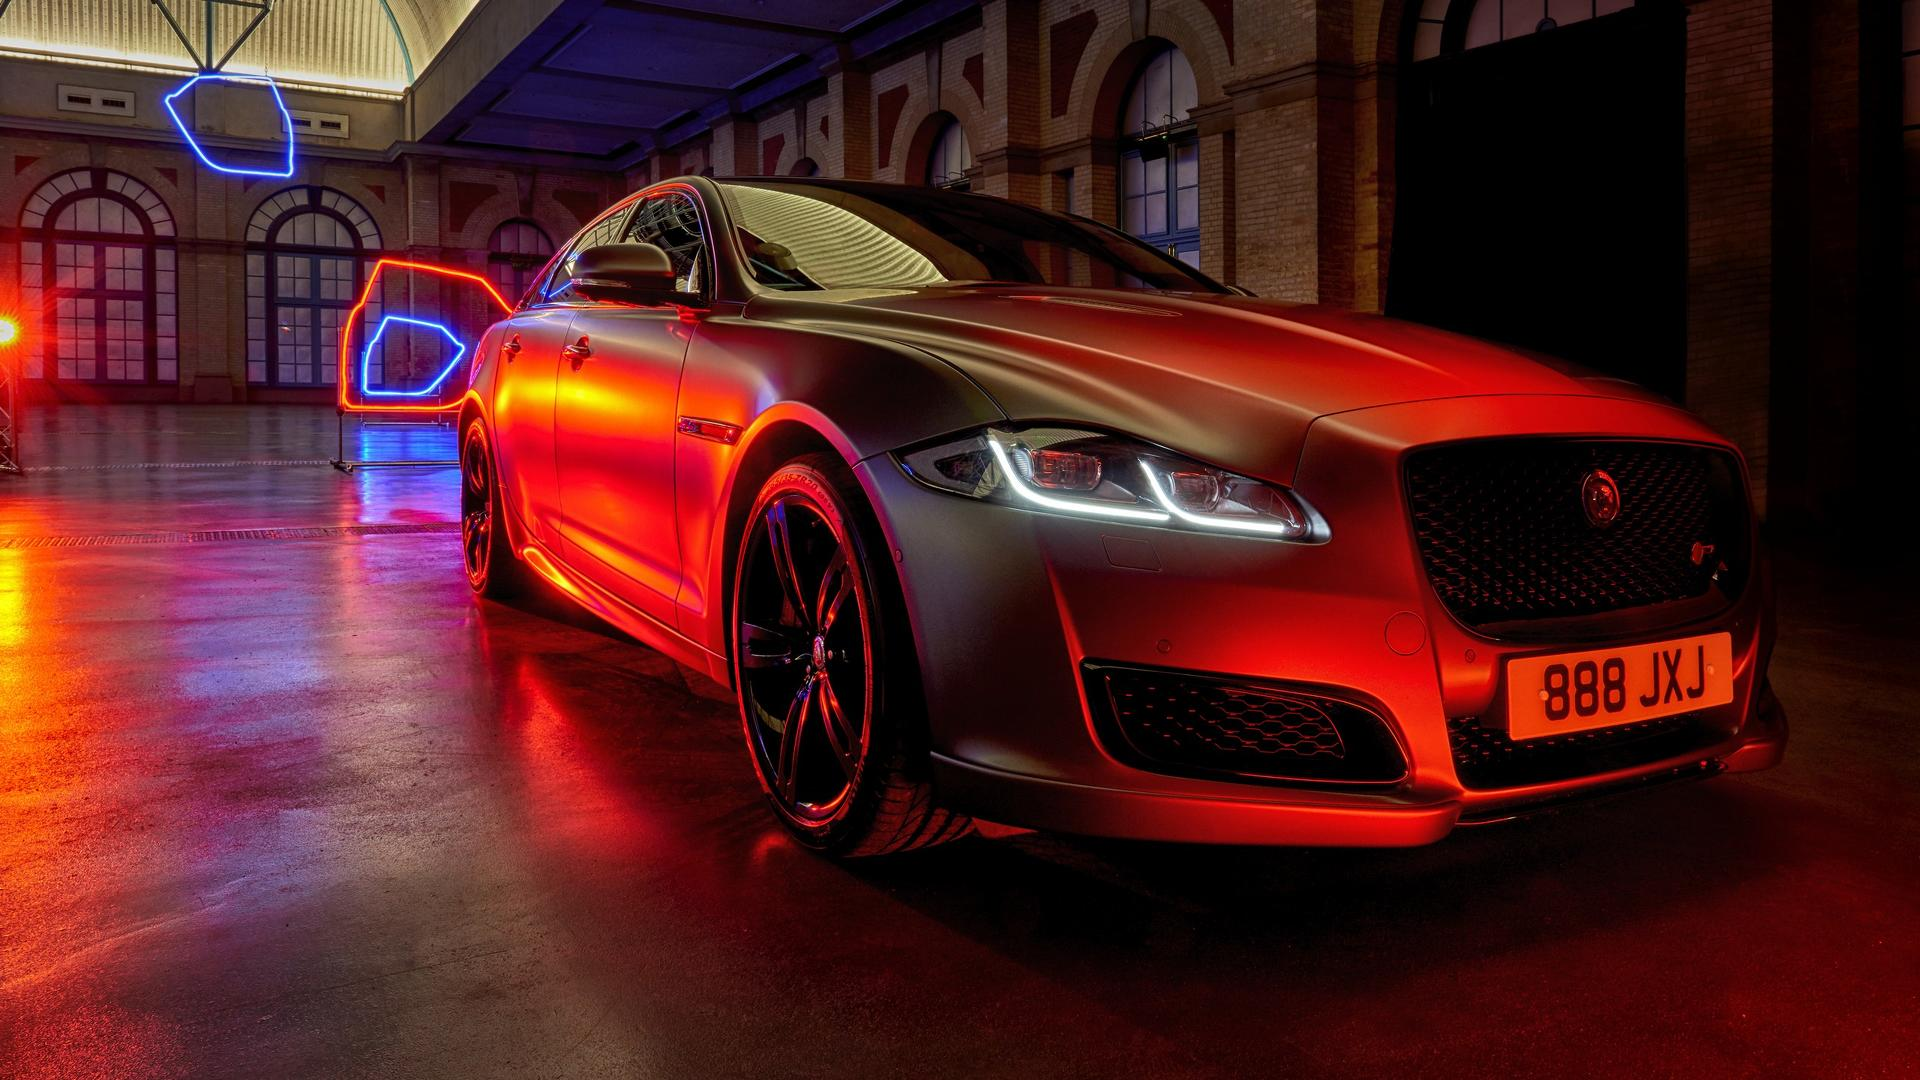 Auto Jaguar 2019 - Polkie Island